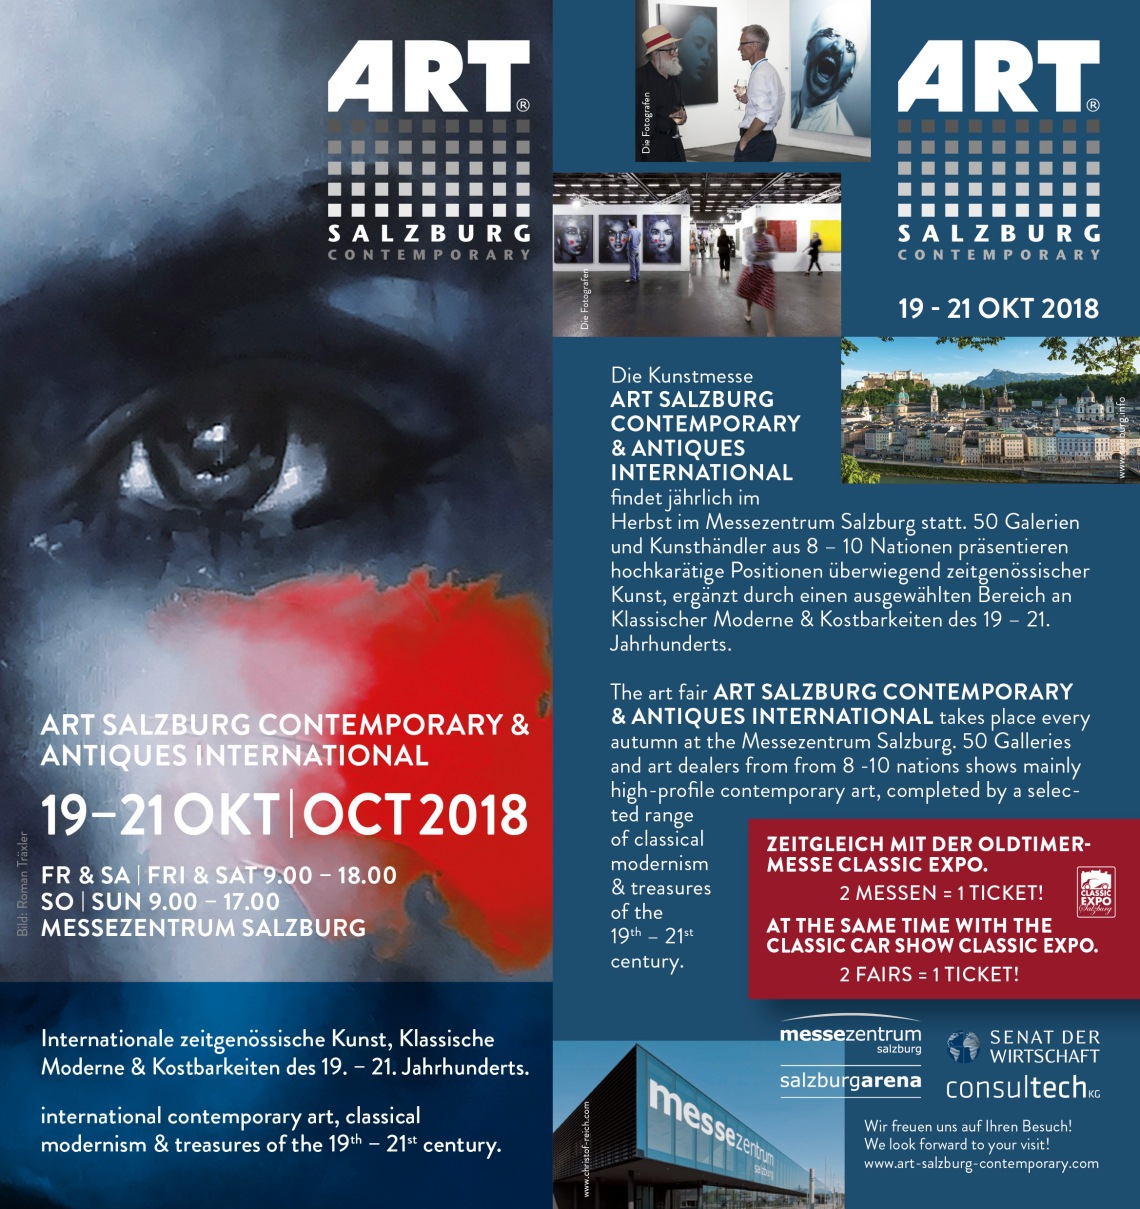 ART_Salzburg_Okt.2018_2seitg_Flyer_f.CLASSIC_EXPO_99x210_3.AUFLA